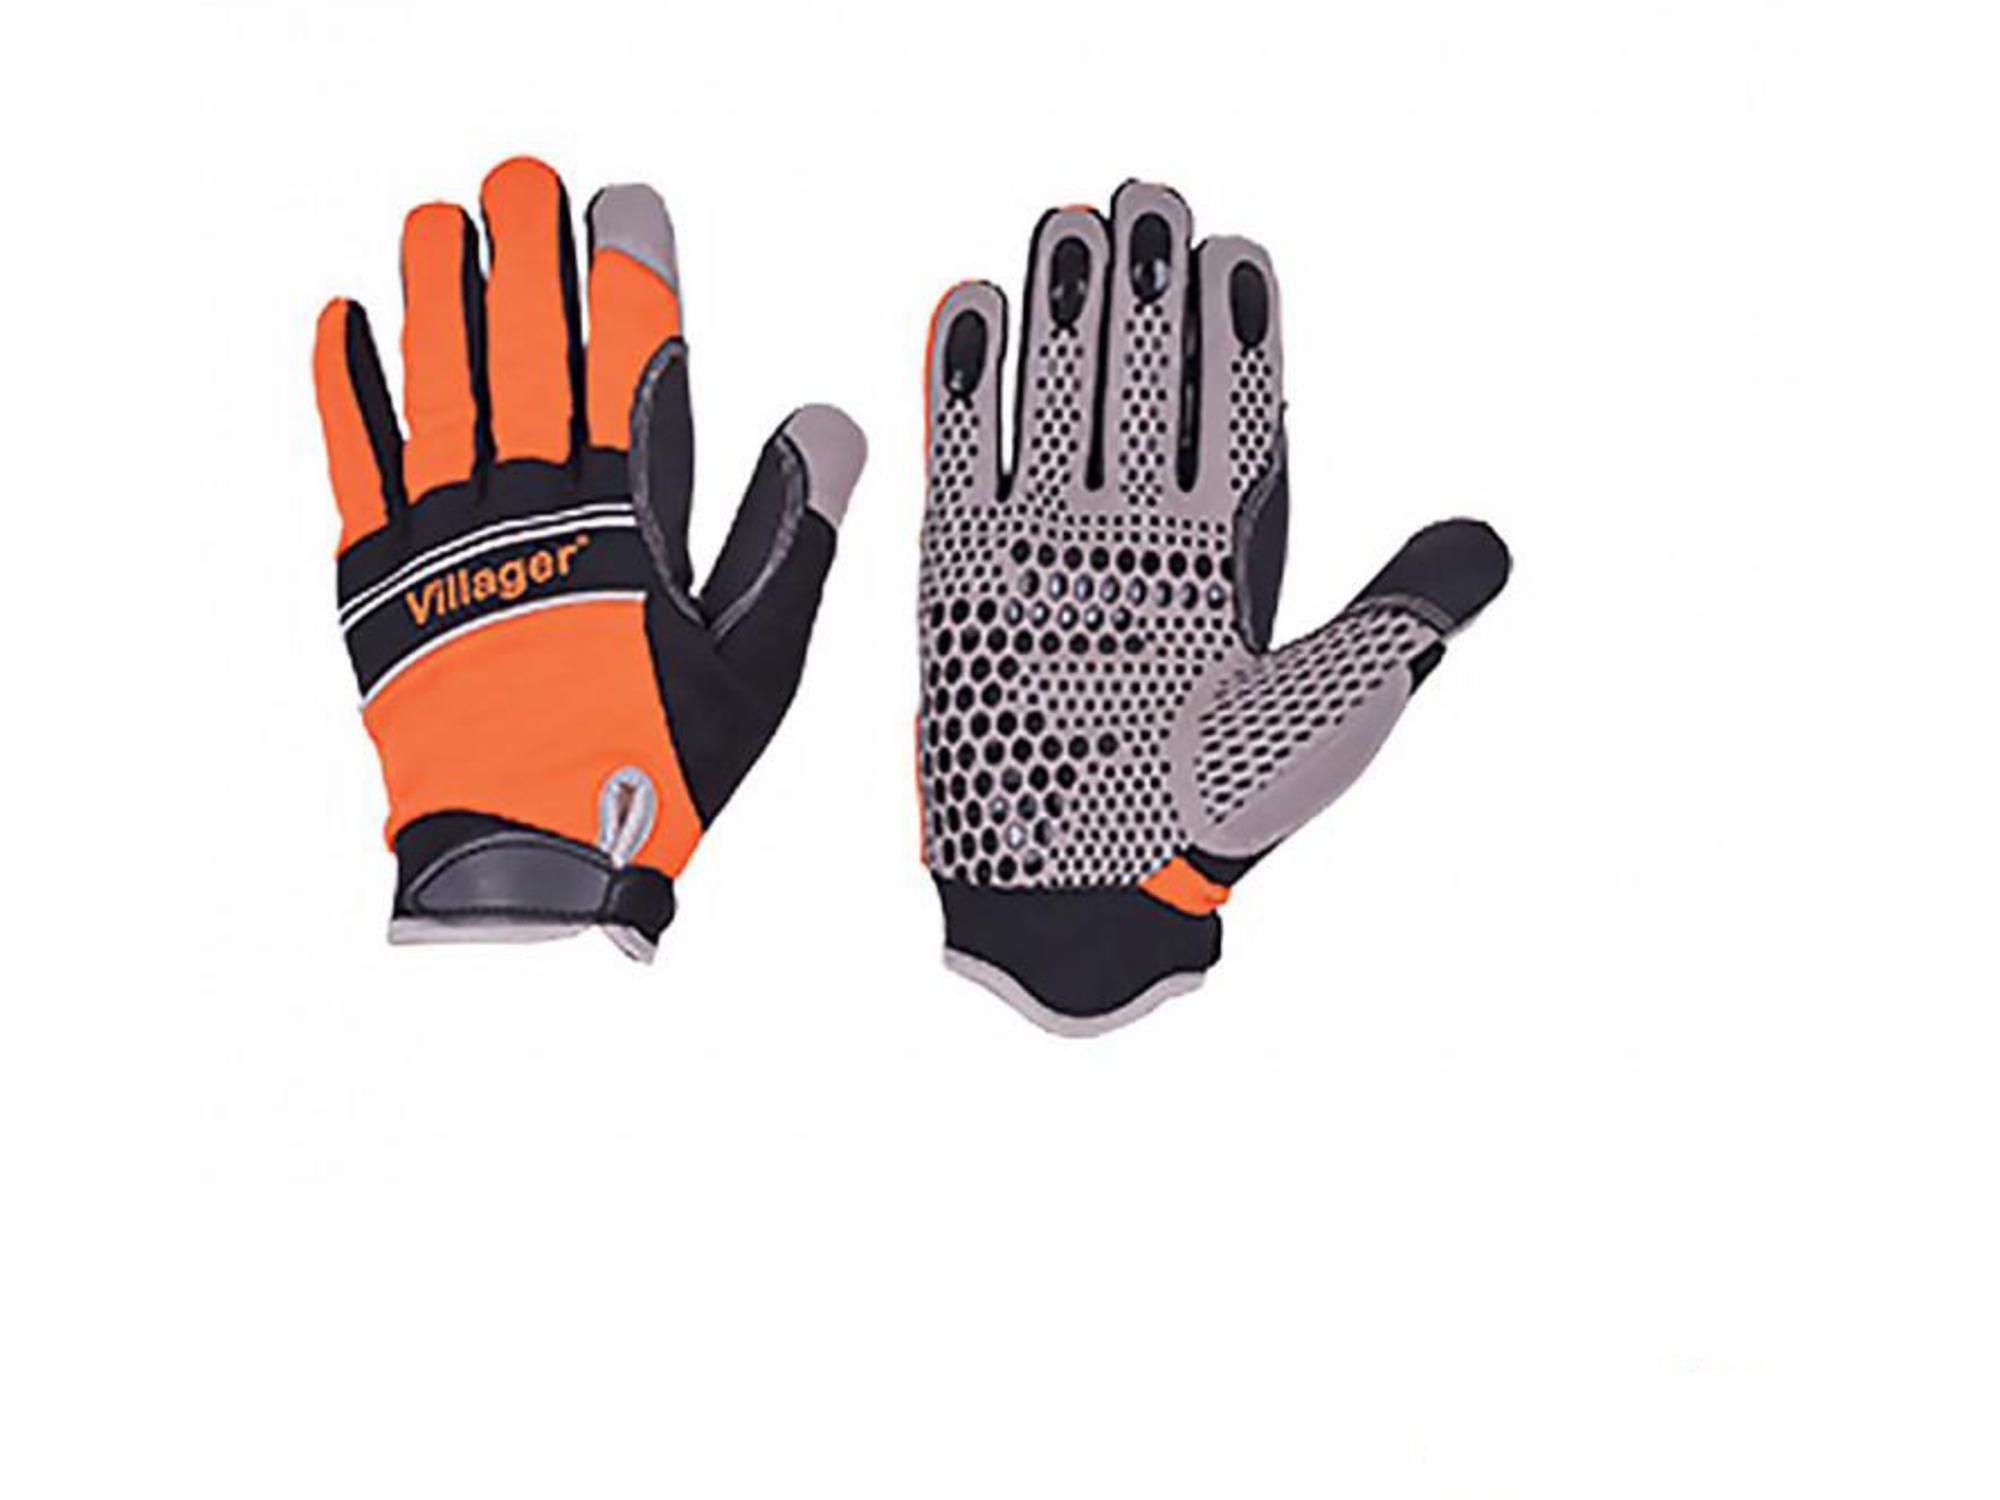 Villager Radne rukavice VWG 15 9 38143